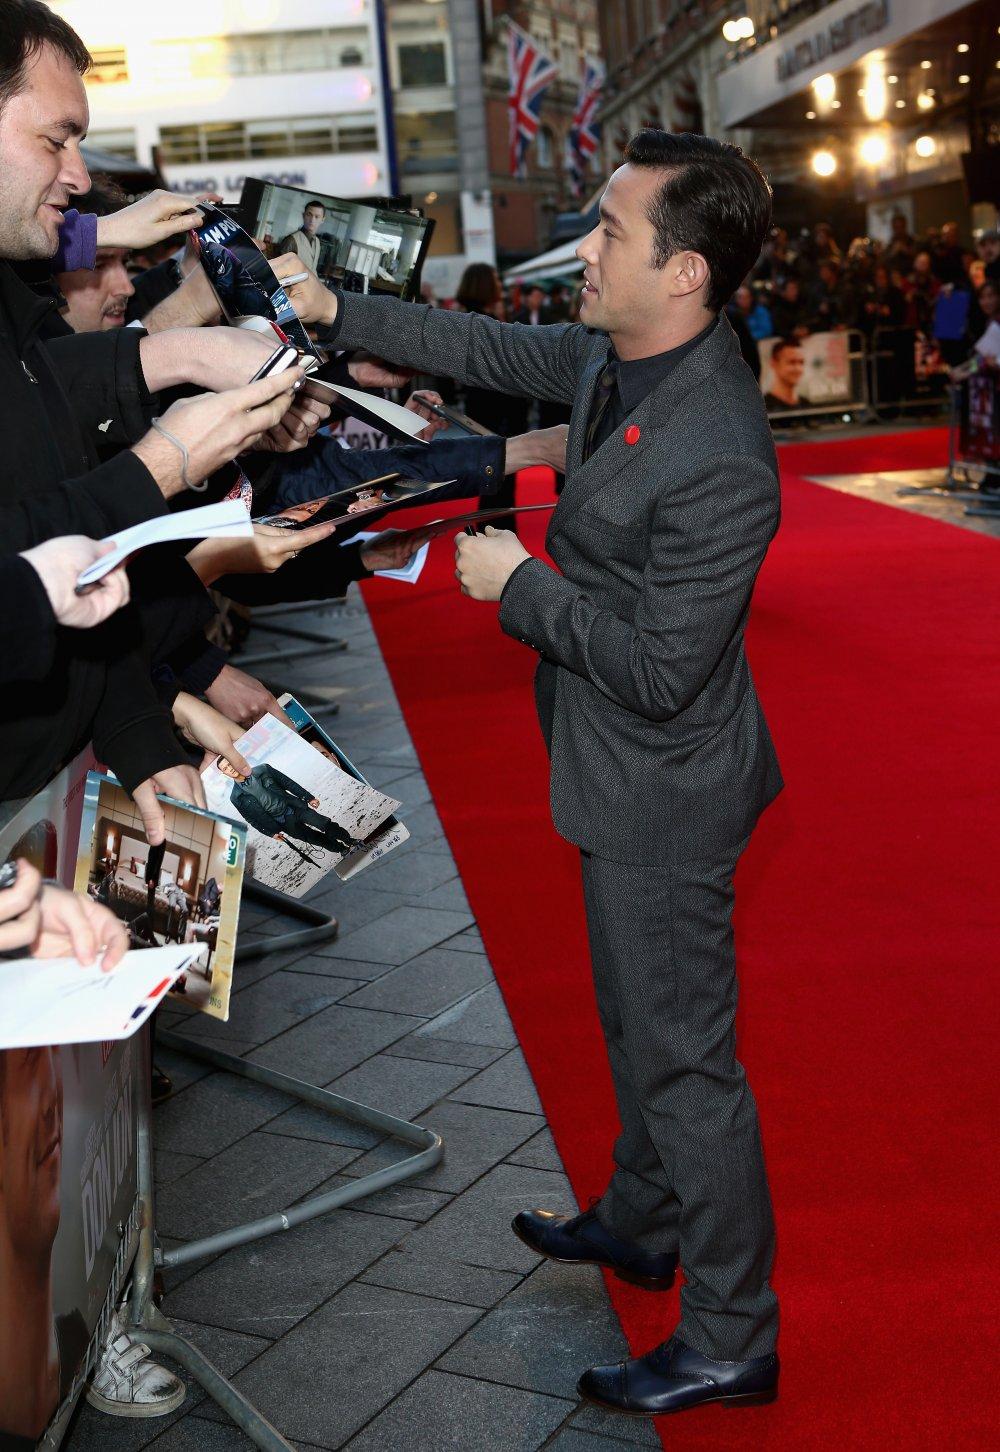 Joseph Gordon-Levitt attends a screening of Don Jon (2013) at the 57th BFI London Film Festival at Odeon West End.